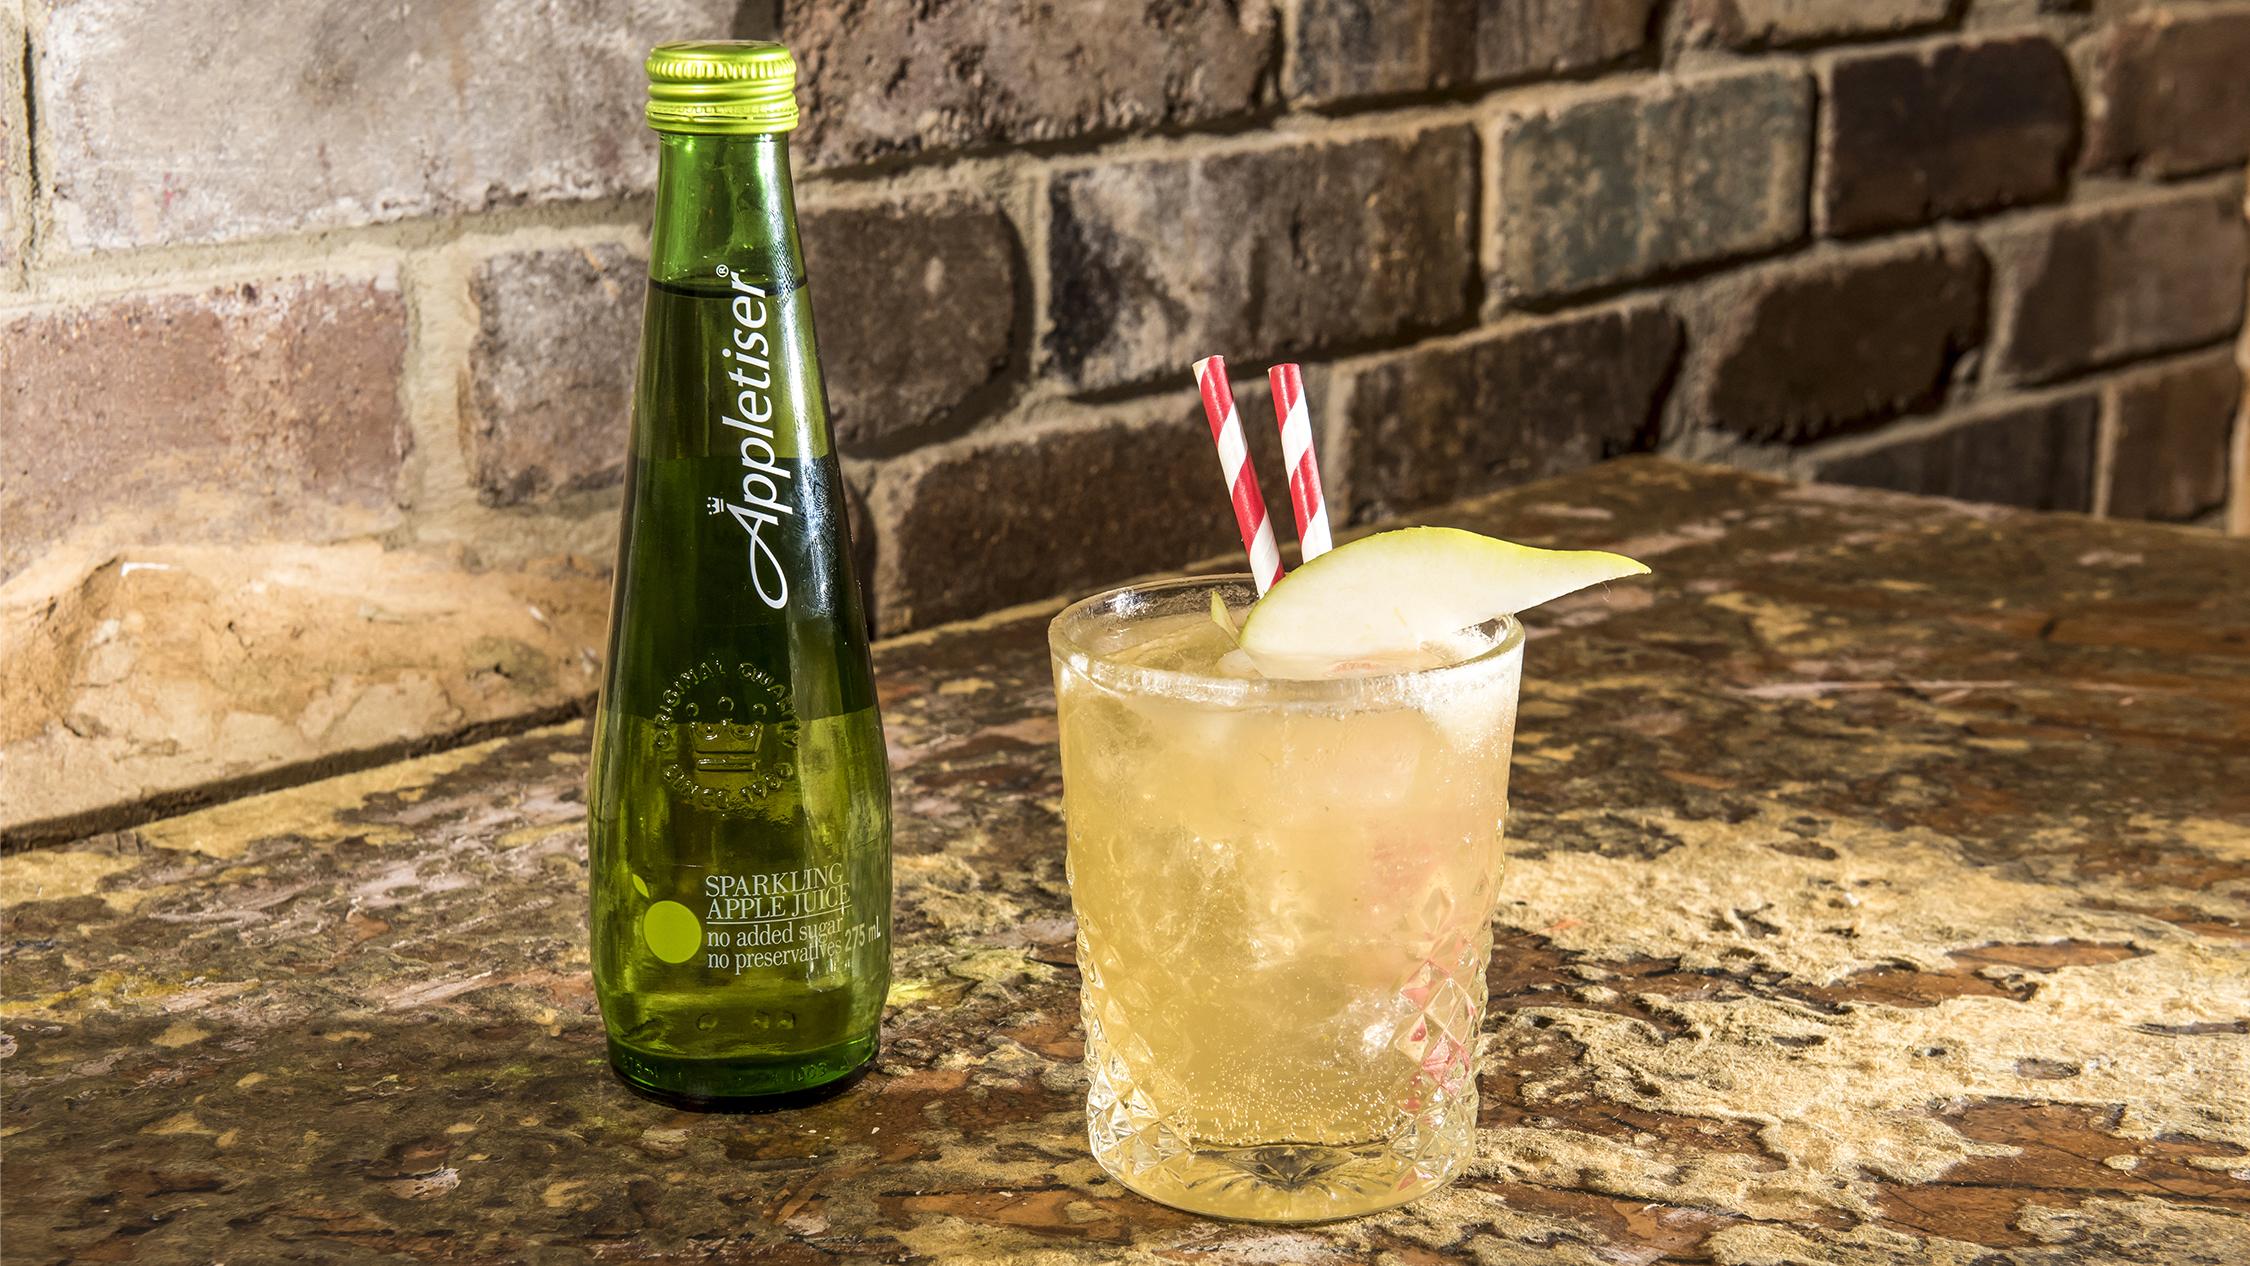 Appletiser cocktail at Soda Factory